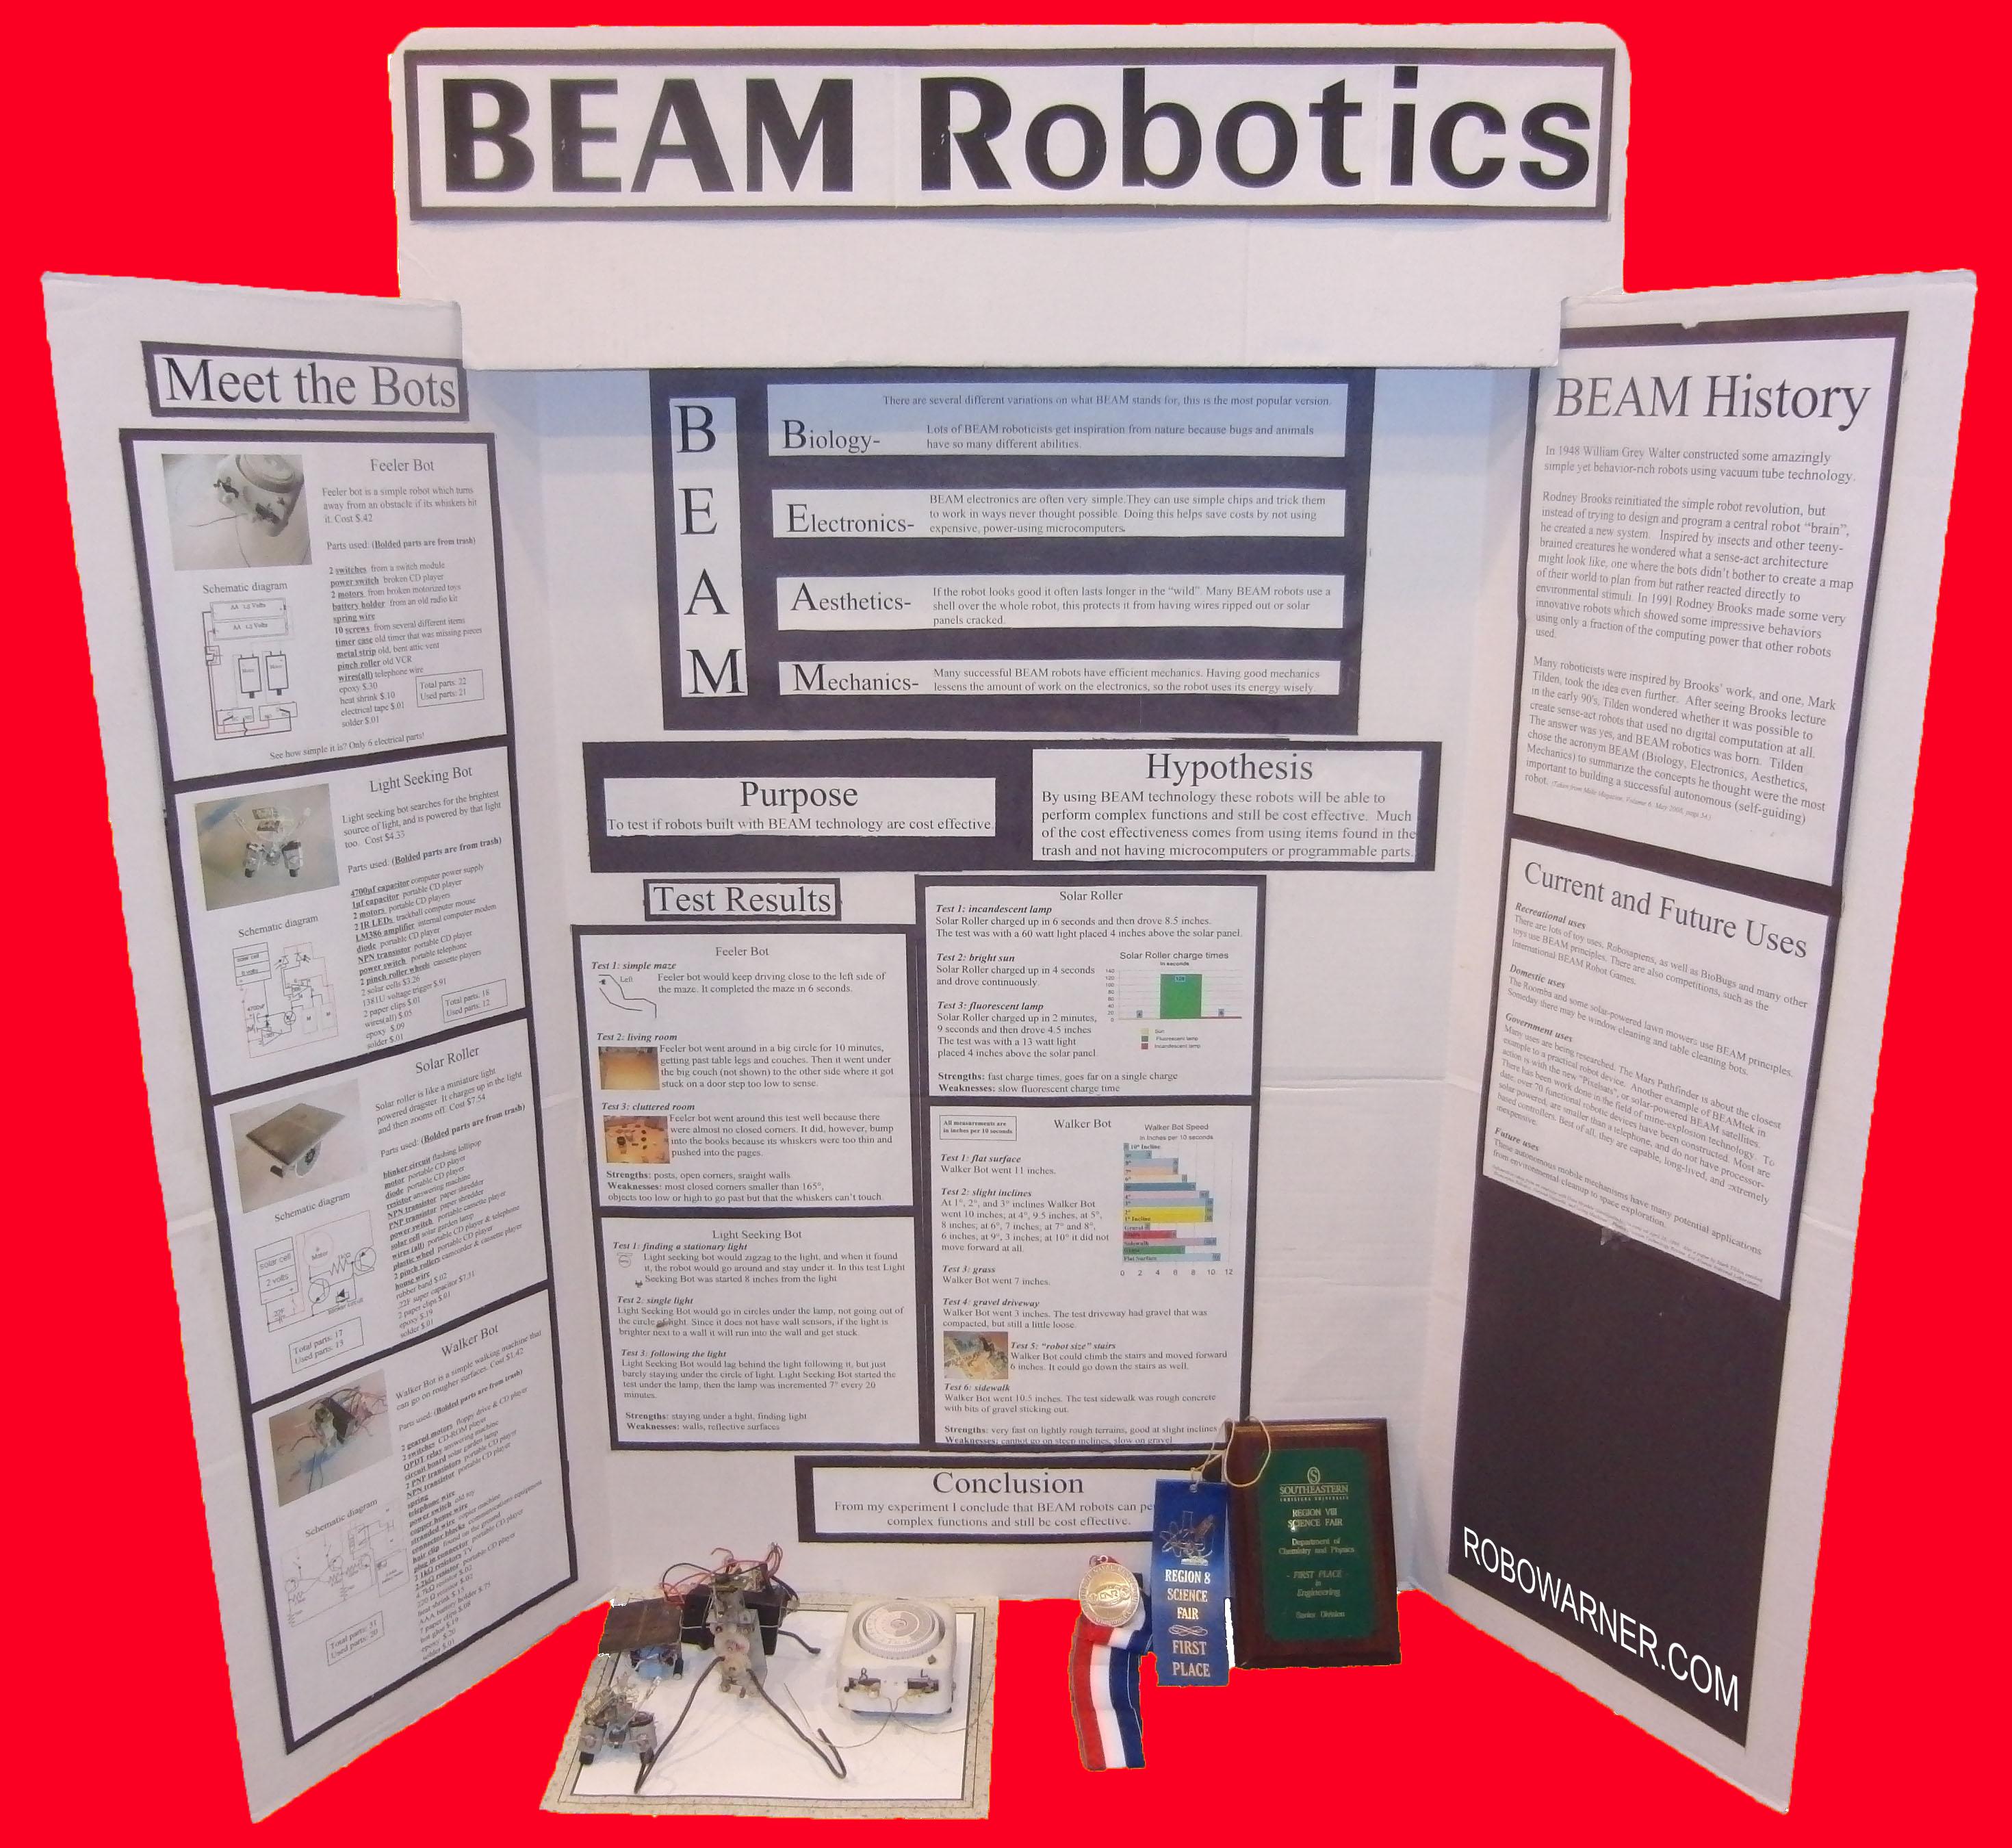 Beam Robots Robowarner With Solar Panel Schematic Diagram Also Npn And Pnp Transistor